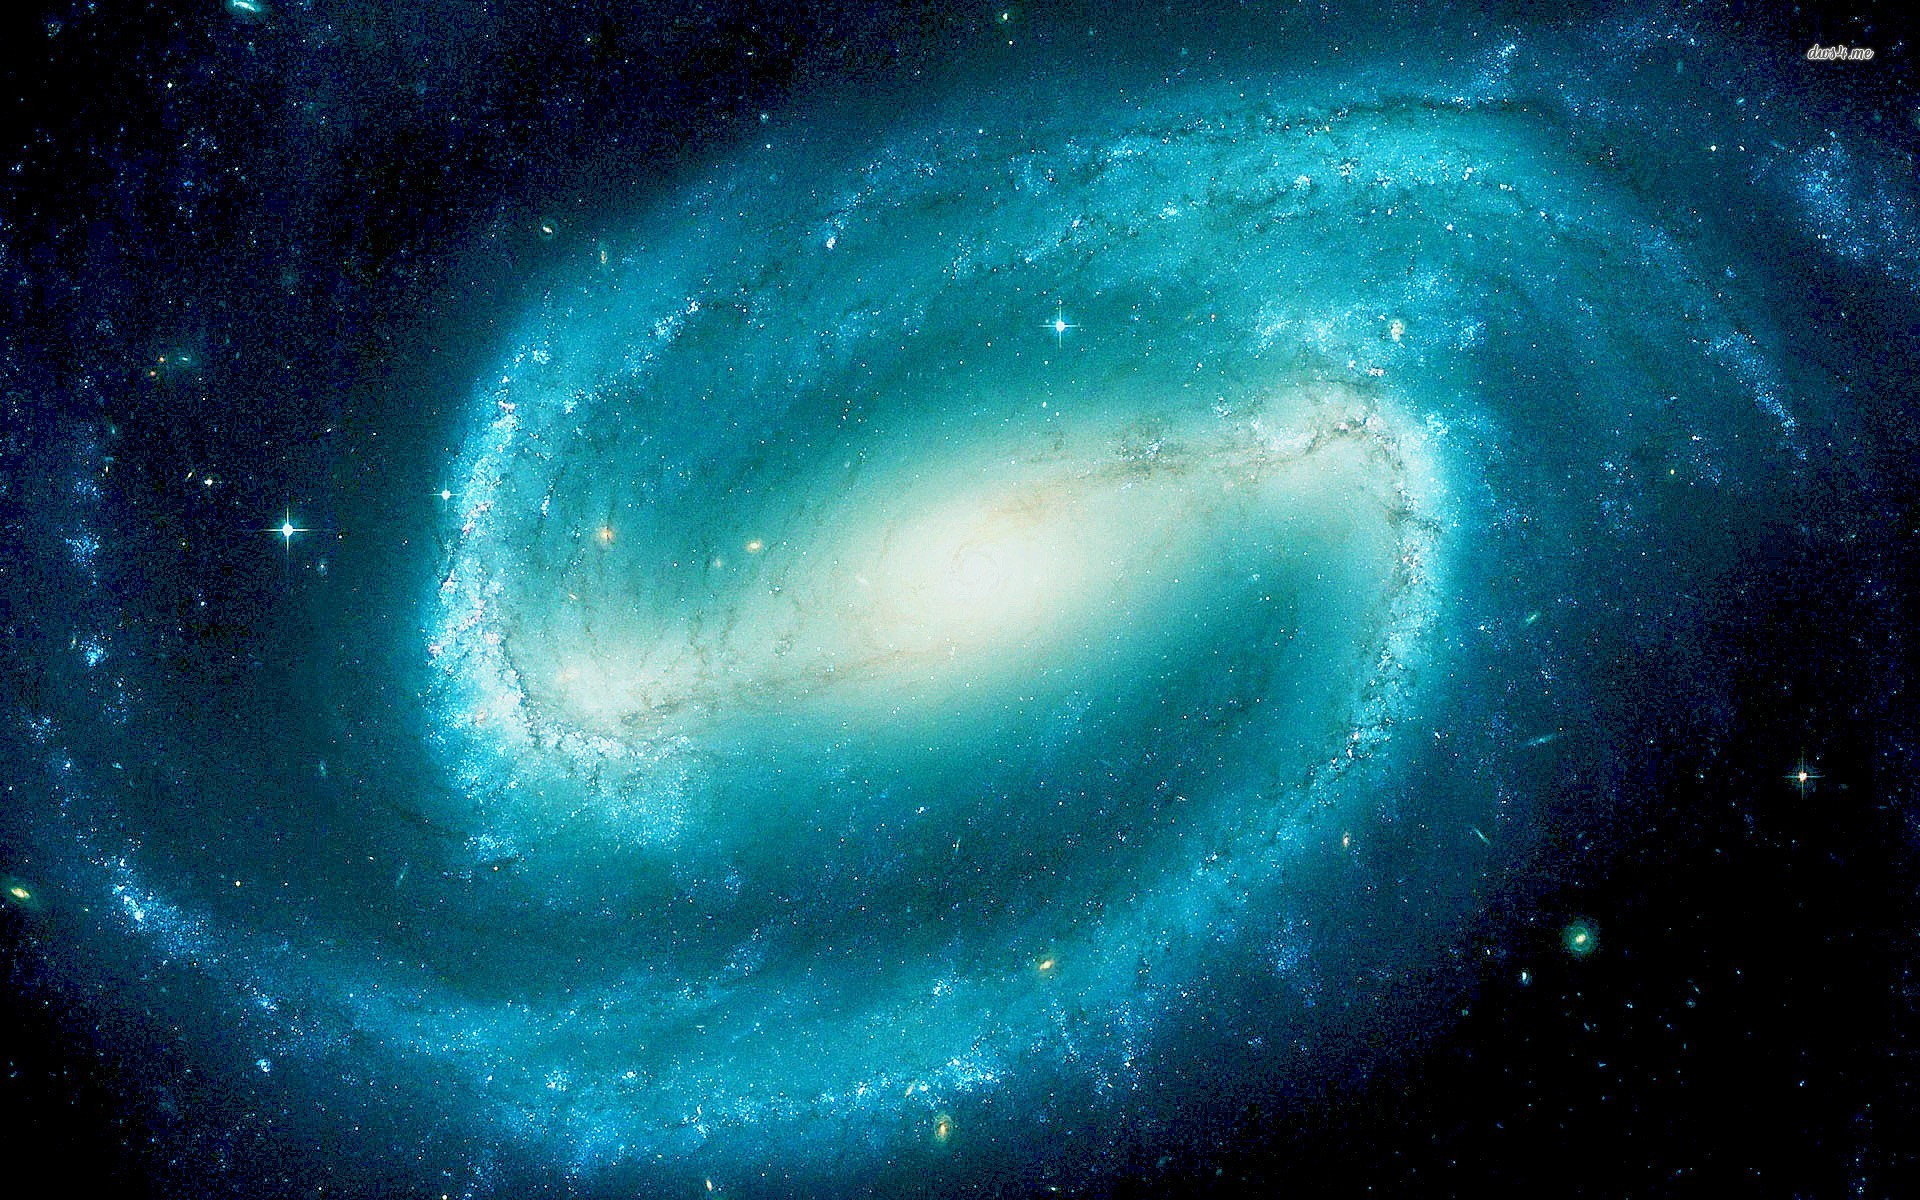 Fiction xanctum galaxy sporewiki fandom powered by wikia - Spore galactic adventures wallpaper ...